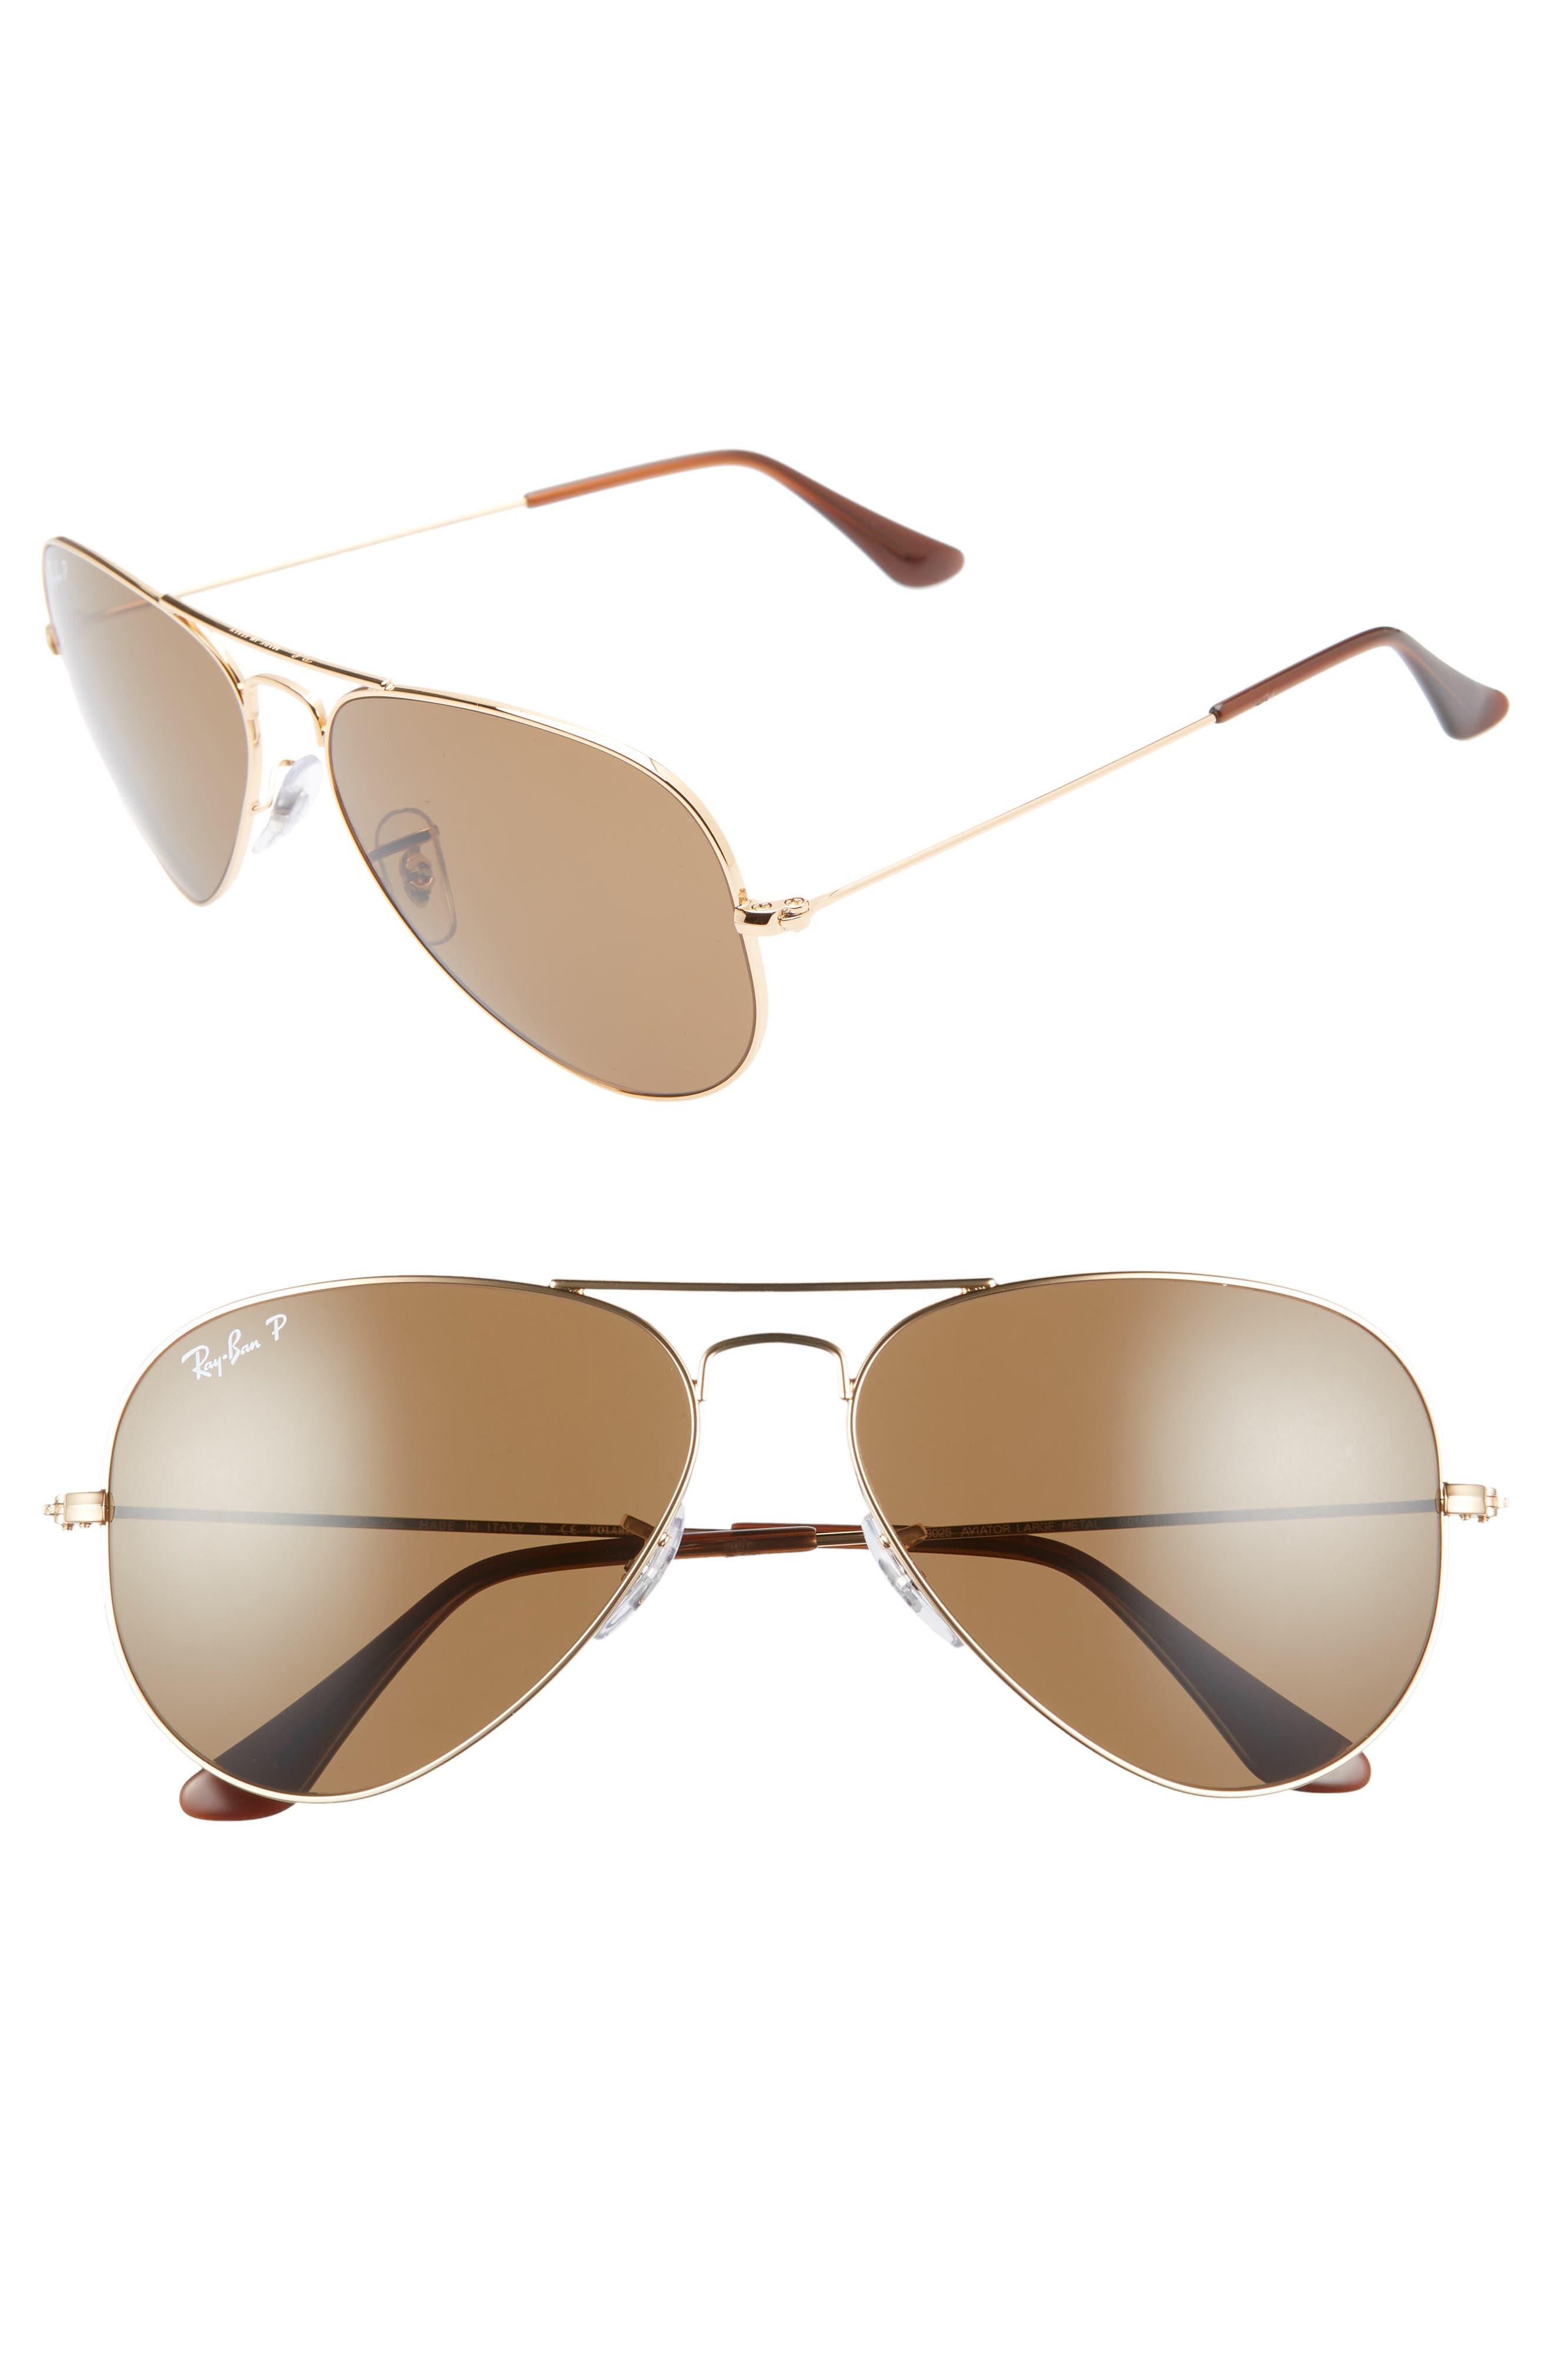 Ray-Ban Original 5m Aviator Sunglasses - Gold/ Brown Solid